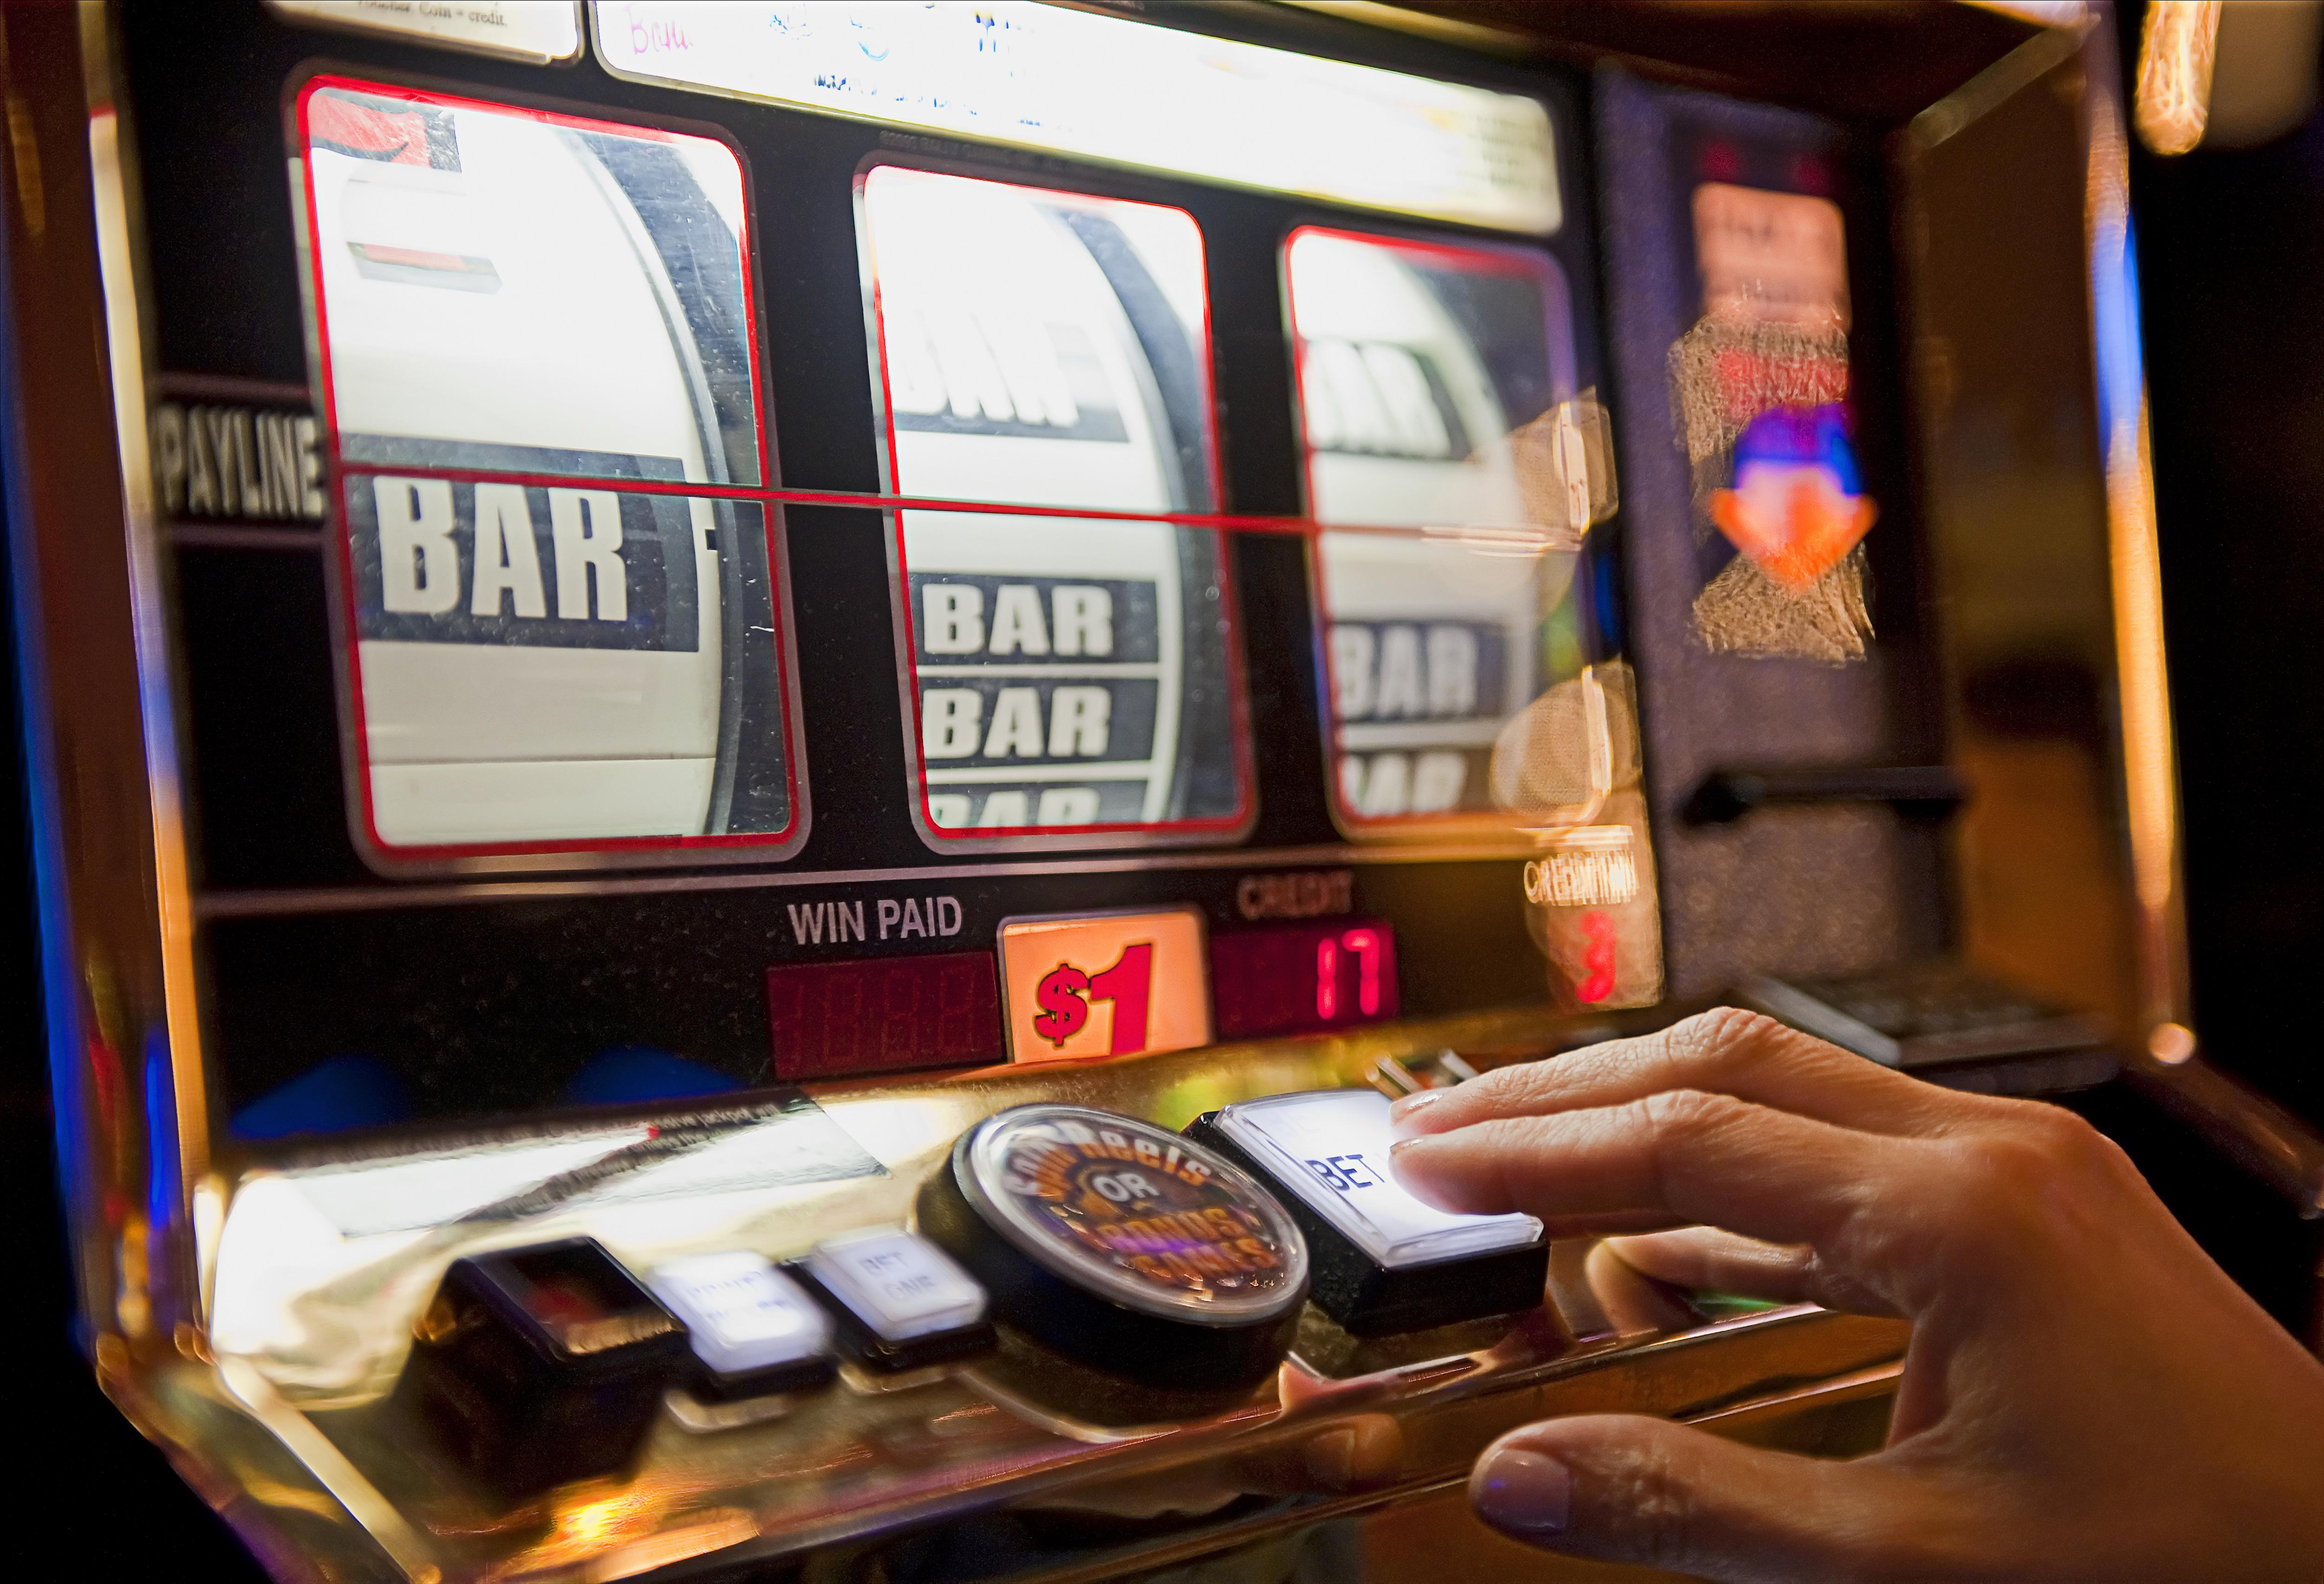 American culture gambling william hill birmingham cup